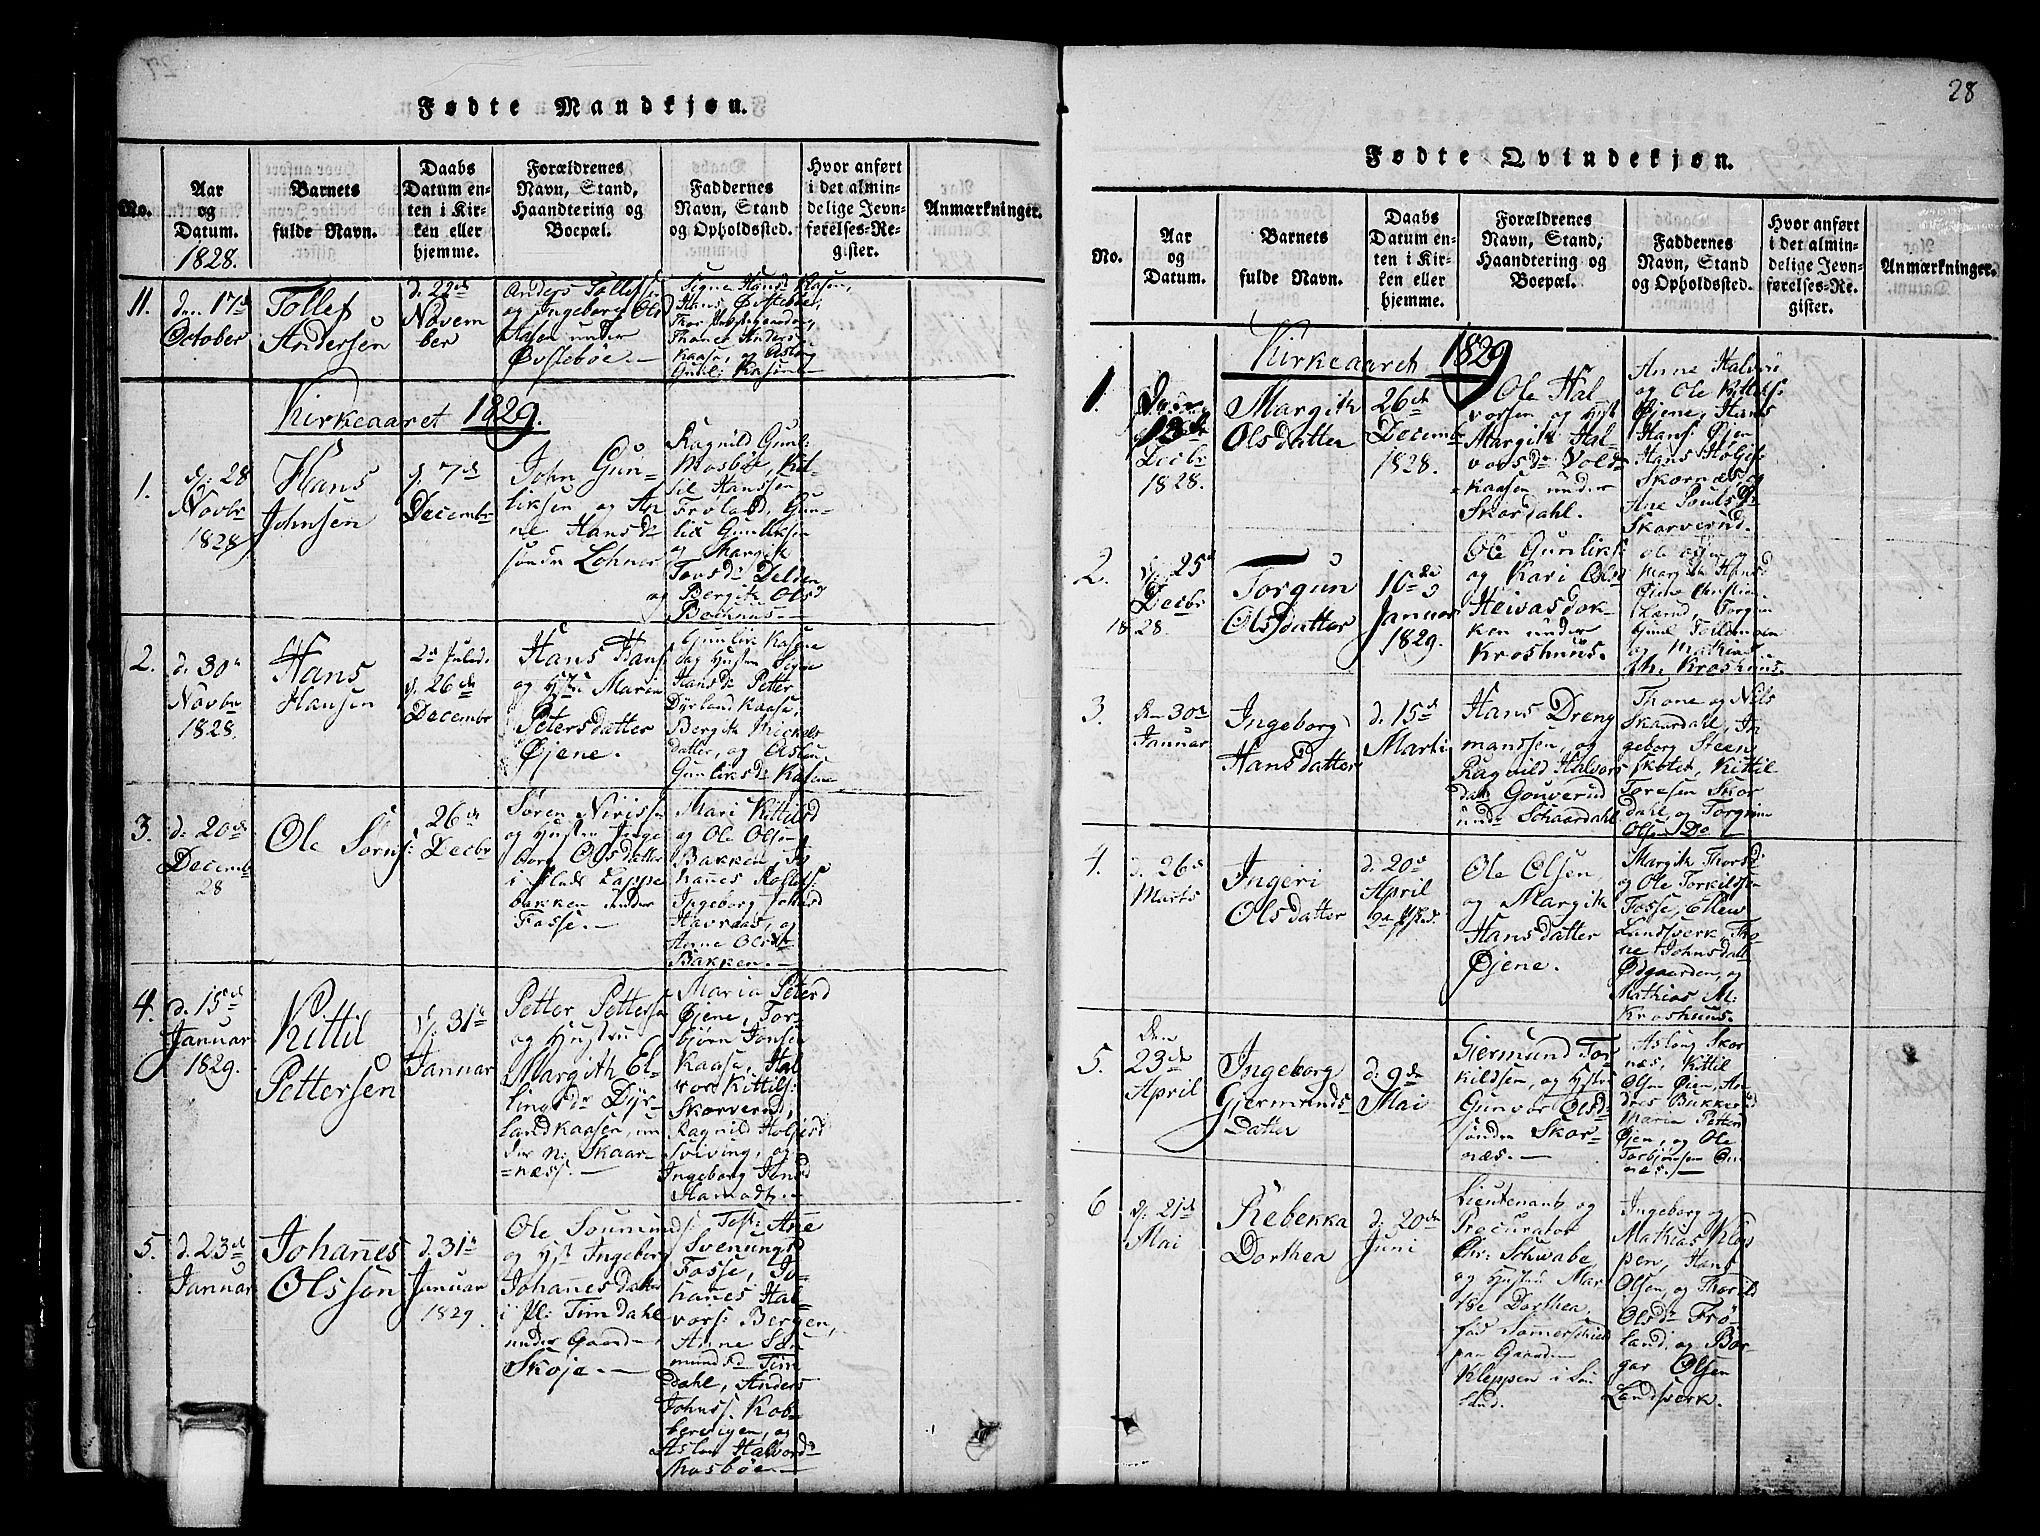 SAKO, Hjartdal kirkebøker, G/Gb/L0001: Klokkerbok nr. II 1, 1815-1842, s. 28